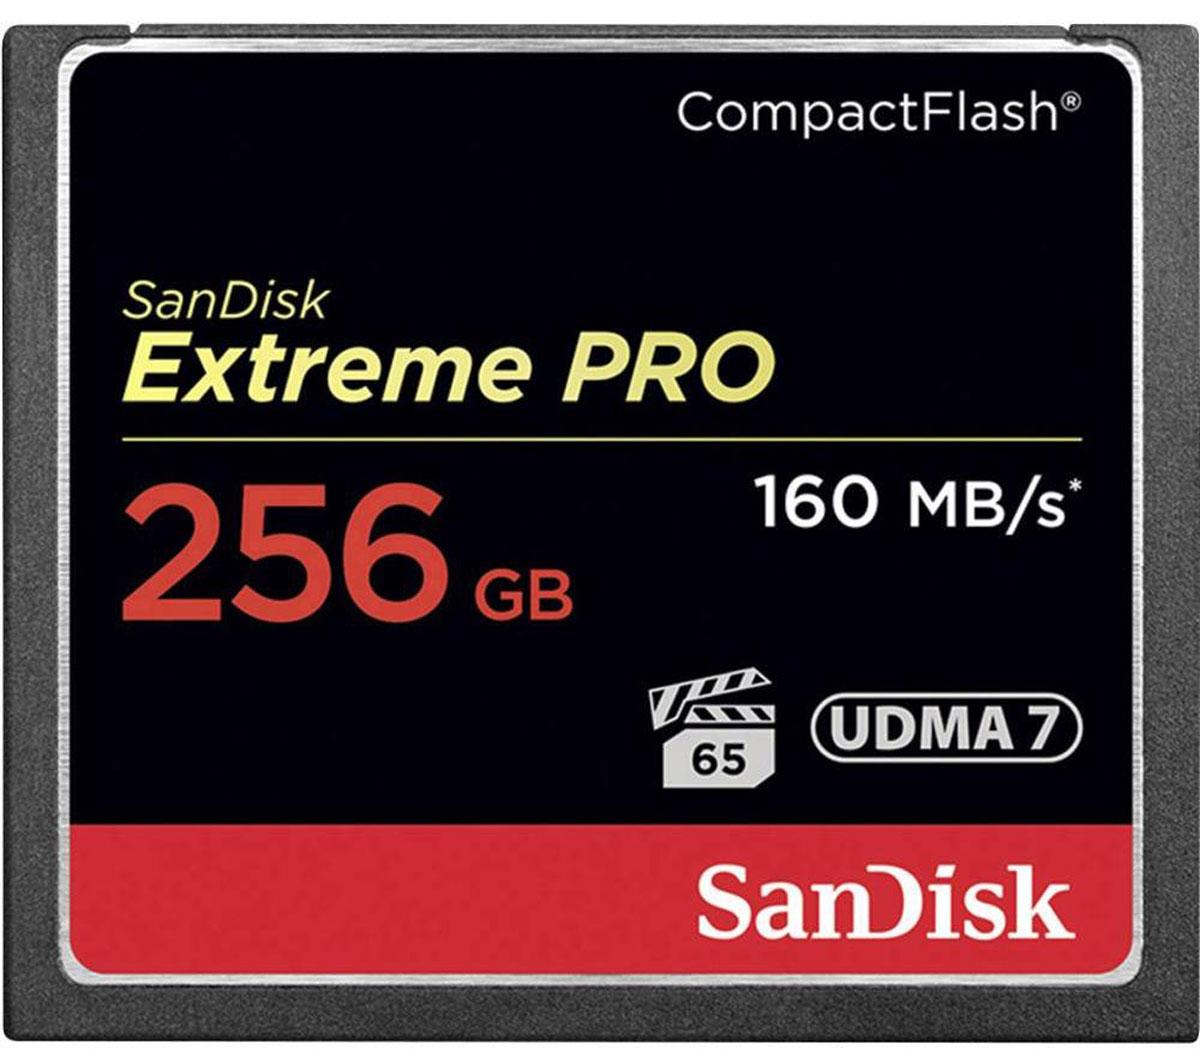 SanDisk Extreme Pro CompactFlash 256GB карта памяти